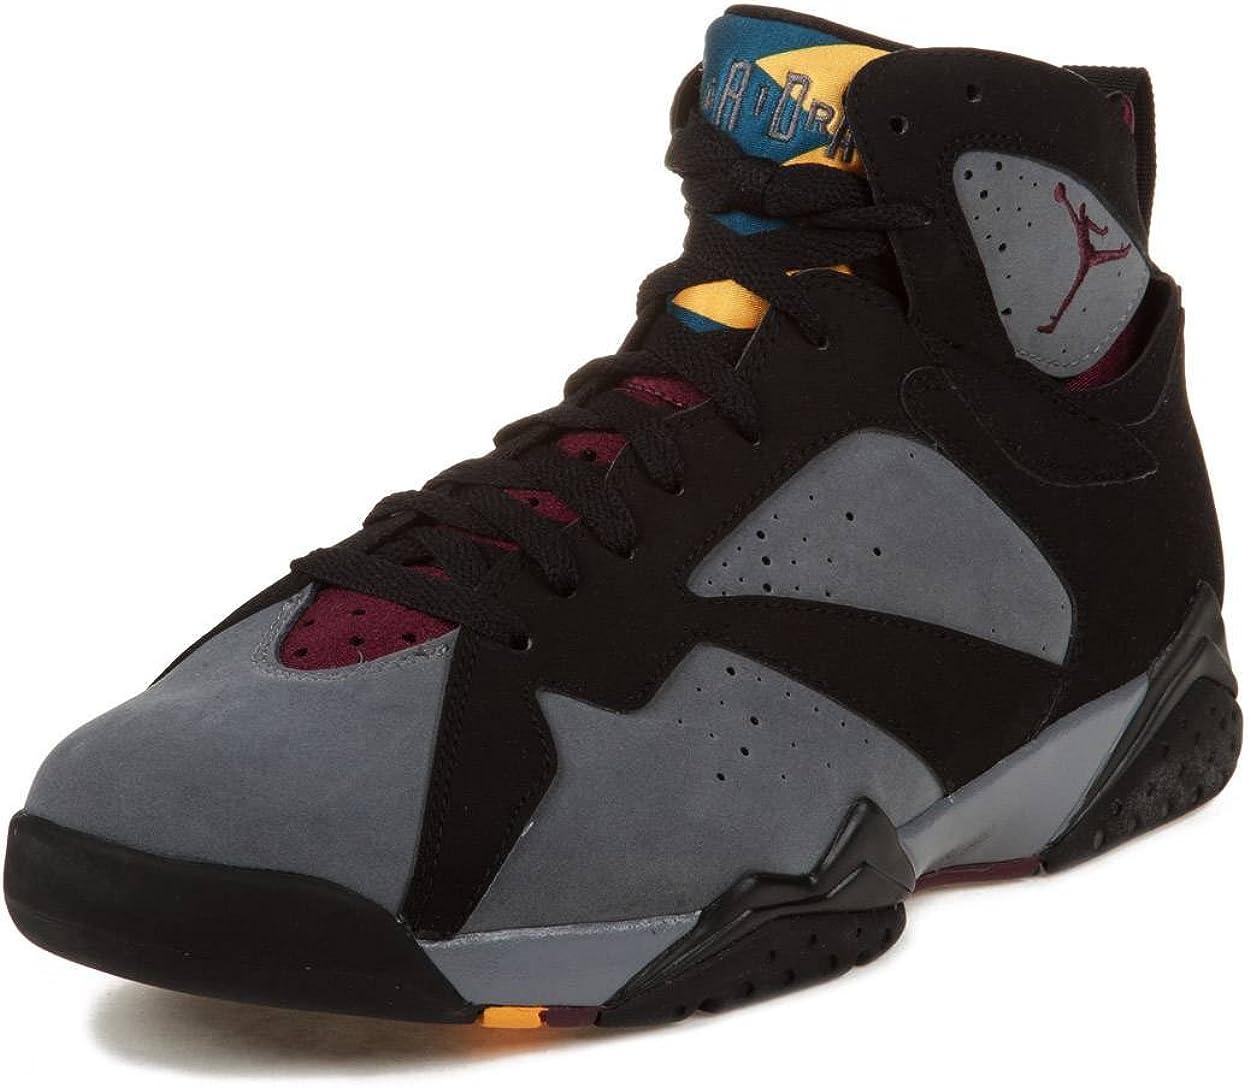 NIKE Mens Air Jordan 7 Retro Olympic